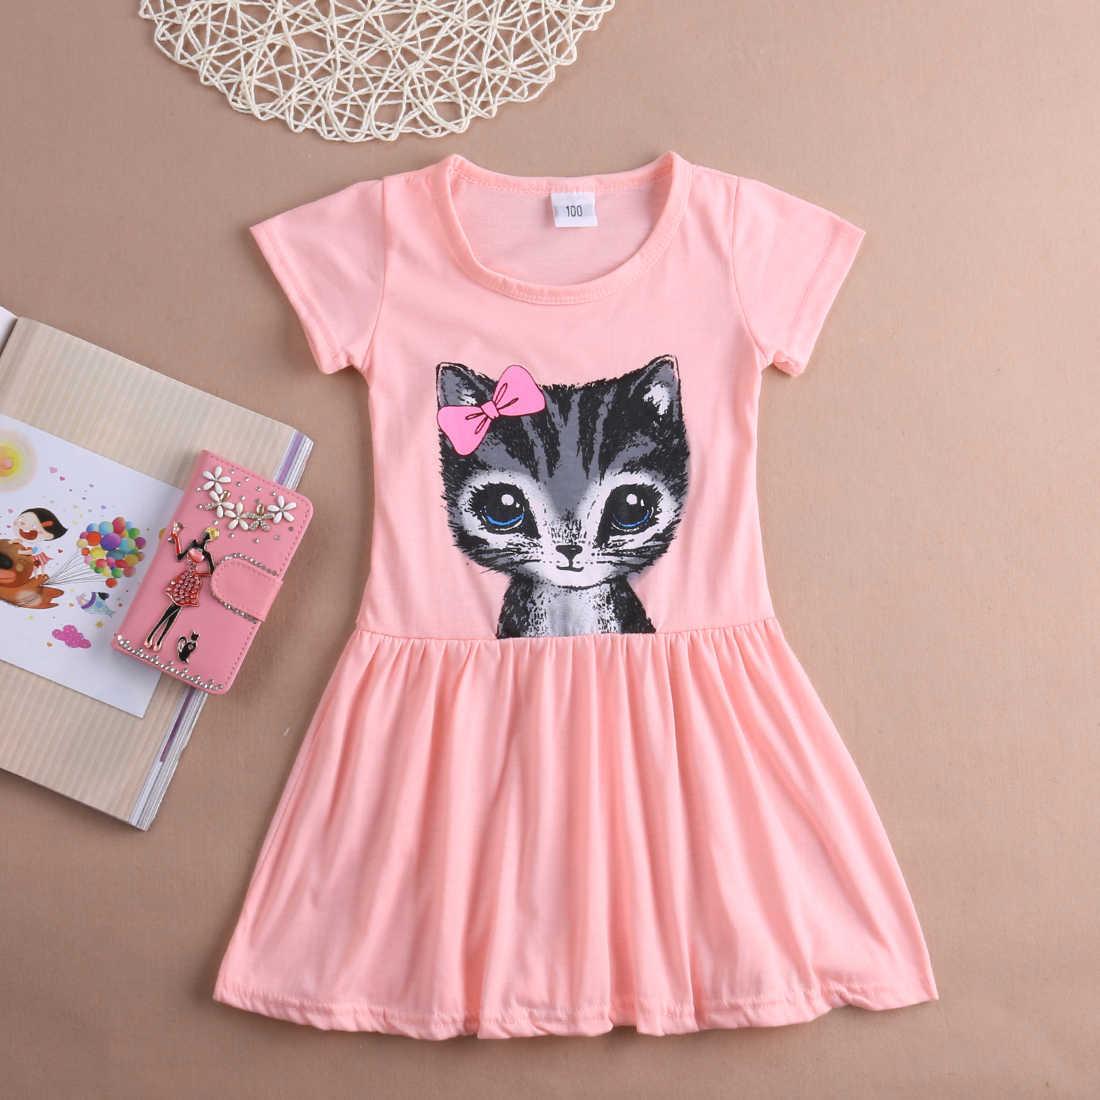 47340fa5 2016 Pink/Grey Baby Kids Girls Cute Cat Kitten Summer Short Sleeve Toddler  Princess Dress Party Tulle Tutu Dress 1-8Y